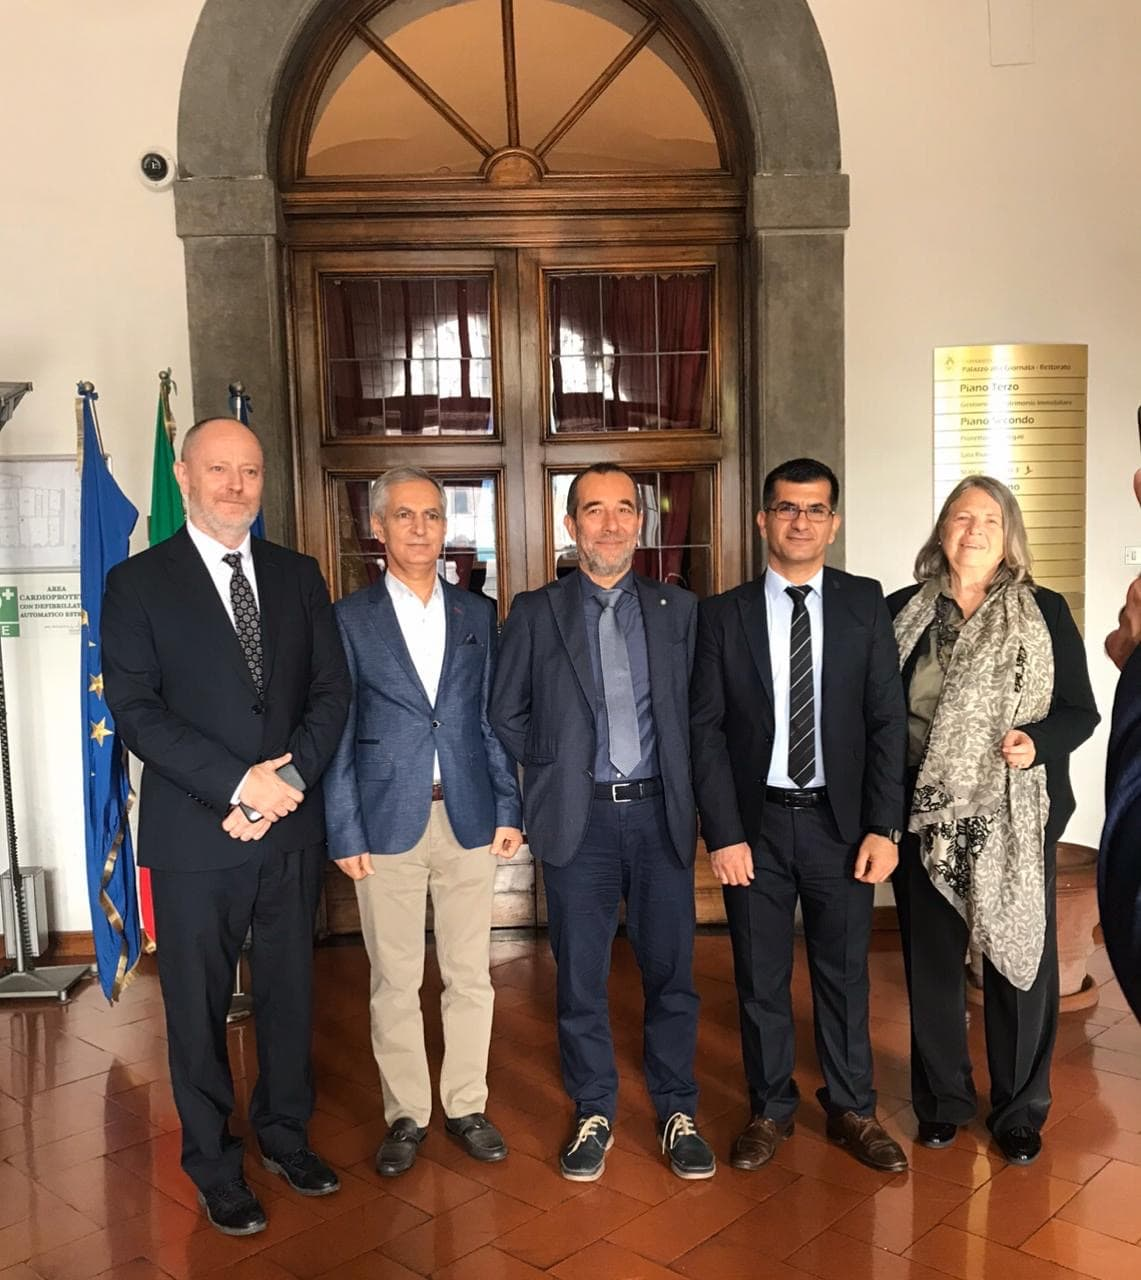 A Delegation Of Erbil Polytechnic University Visiting The University Of Pisa European